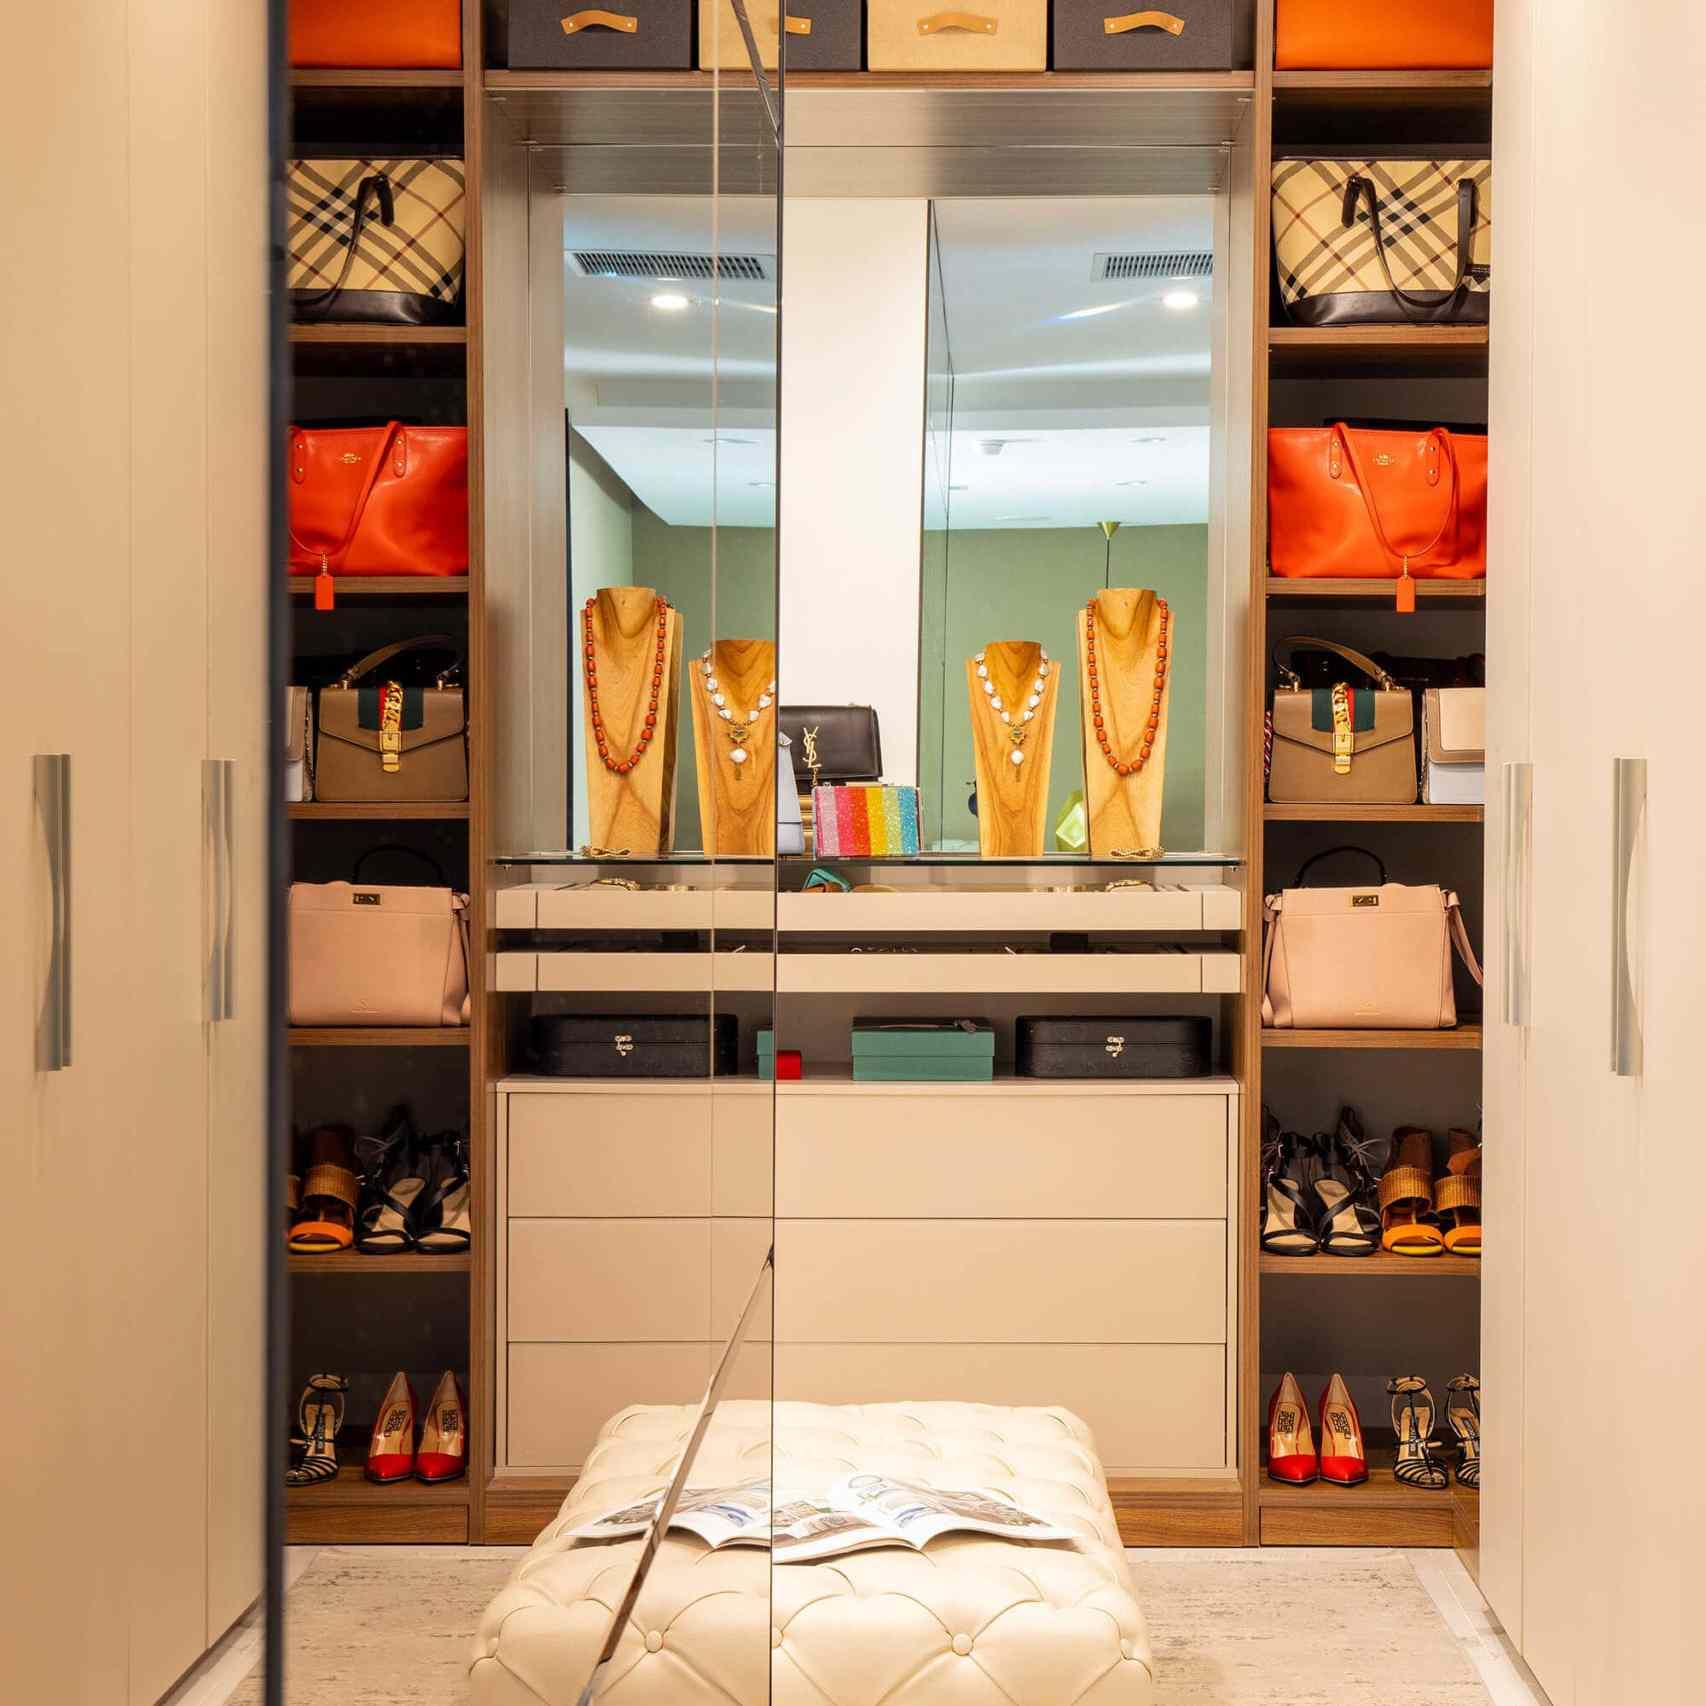 13 Beautiful Walk-In Closet Design Ideas